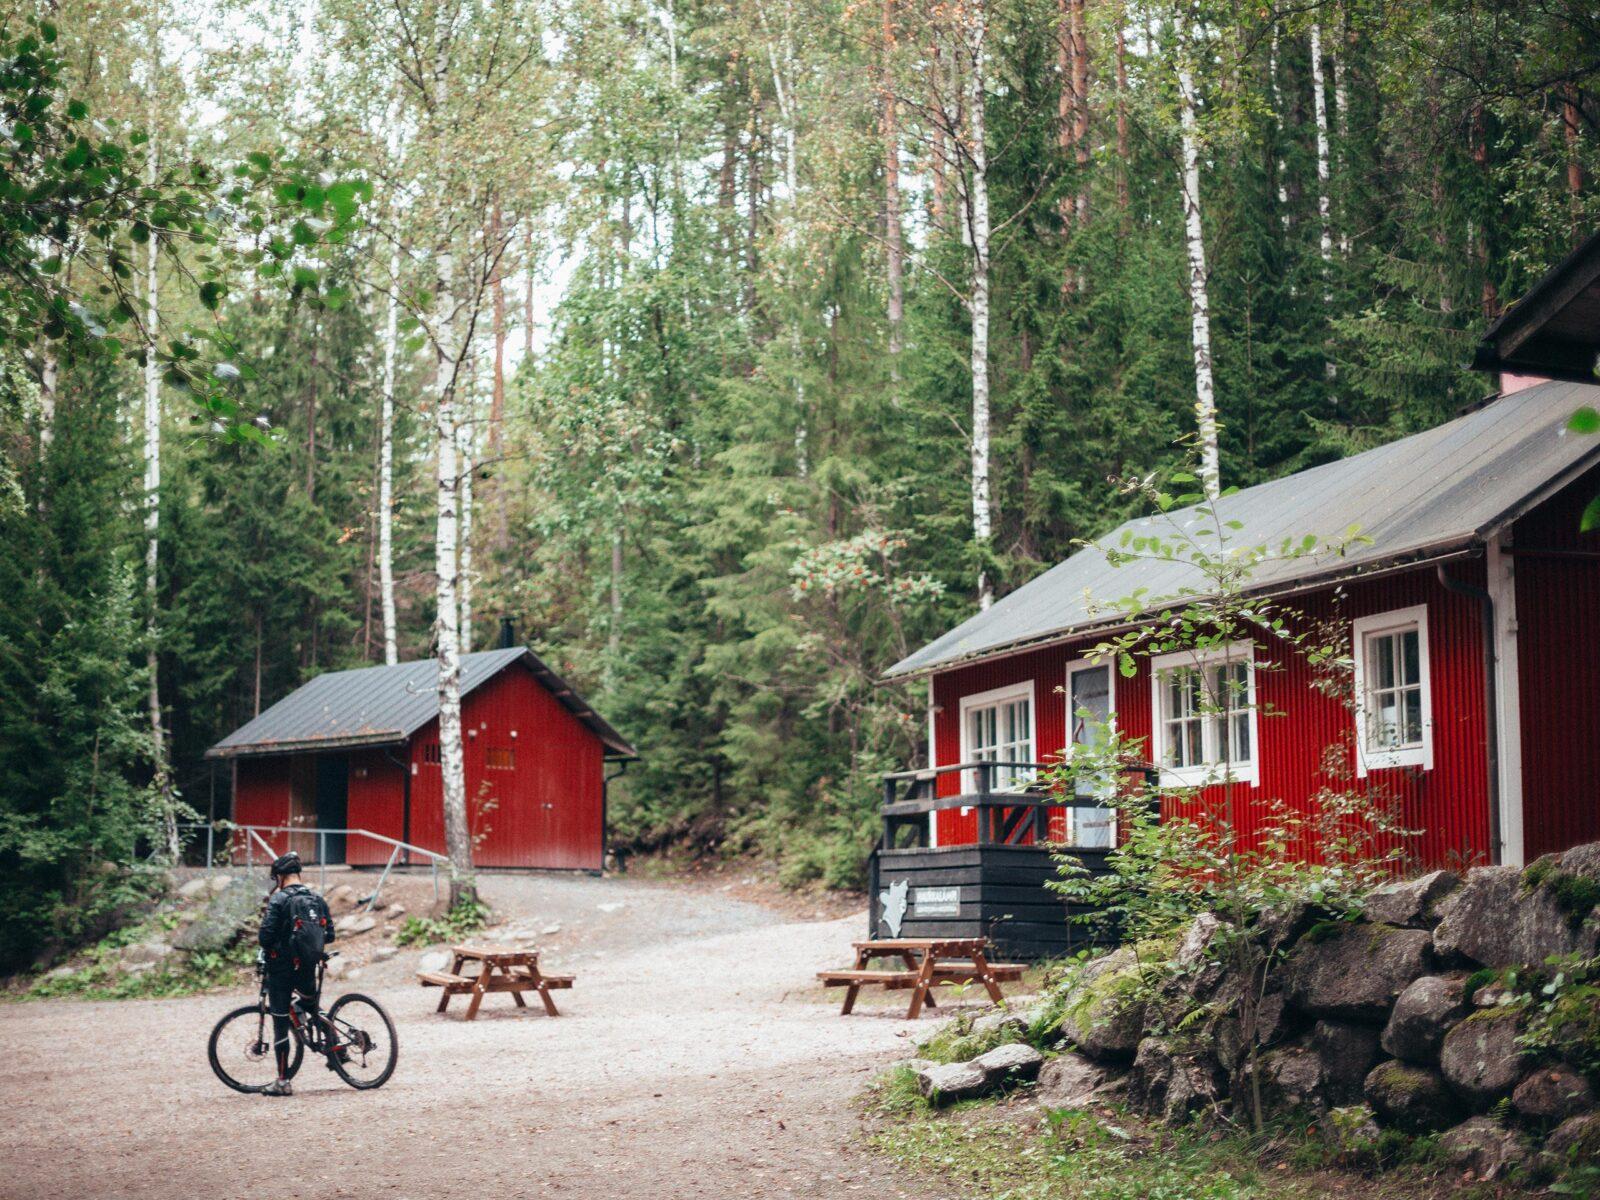 Cyklist vid stuga i skogen